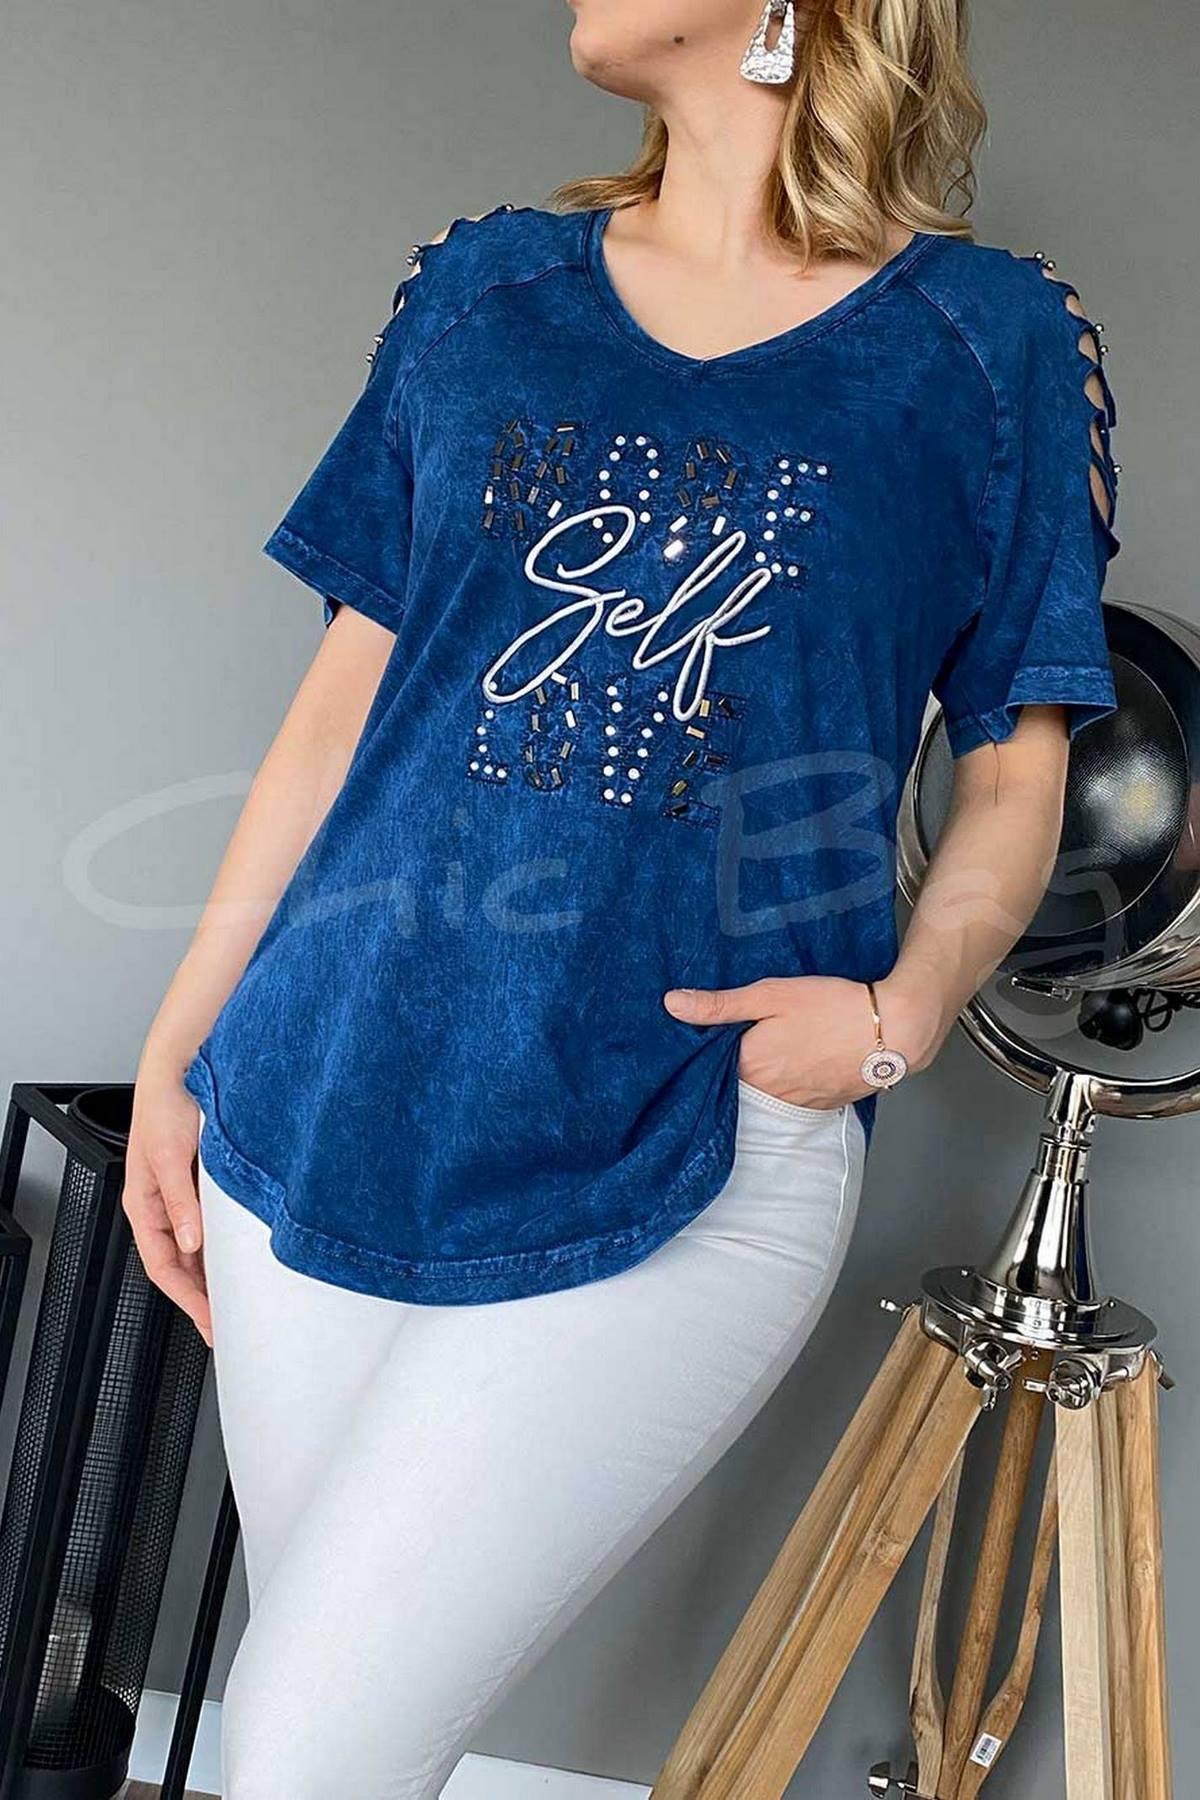 https://resim.chicbag.com.tr/p000816/lcv/more-self-love-baski-omuz-kesik-dekolteli-v-yaka-t-shirt-swns-01e08247a0ee.